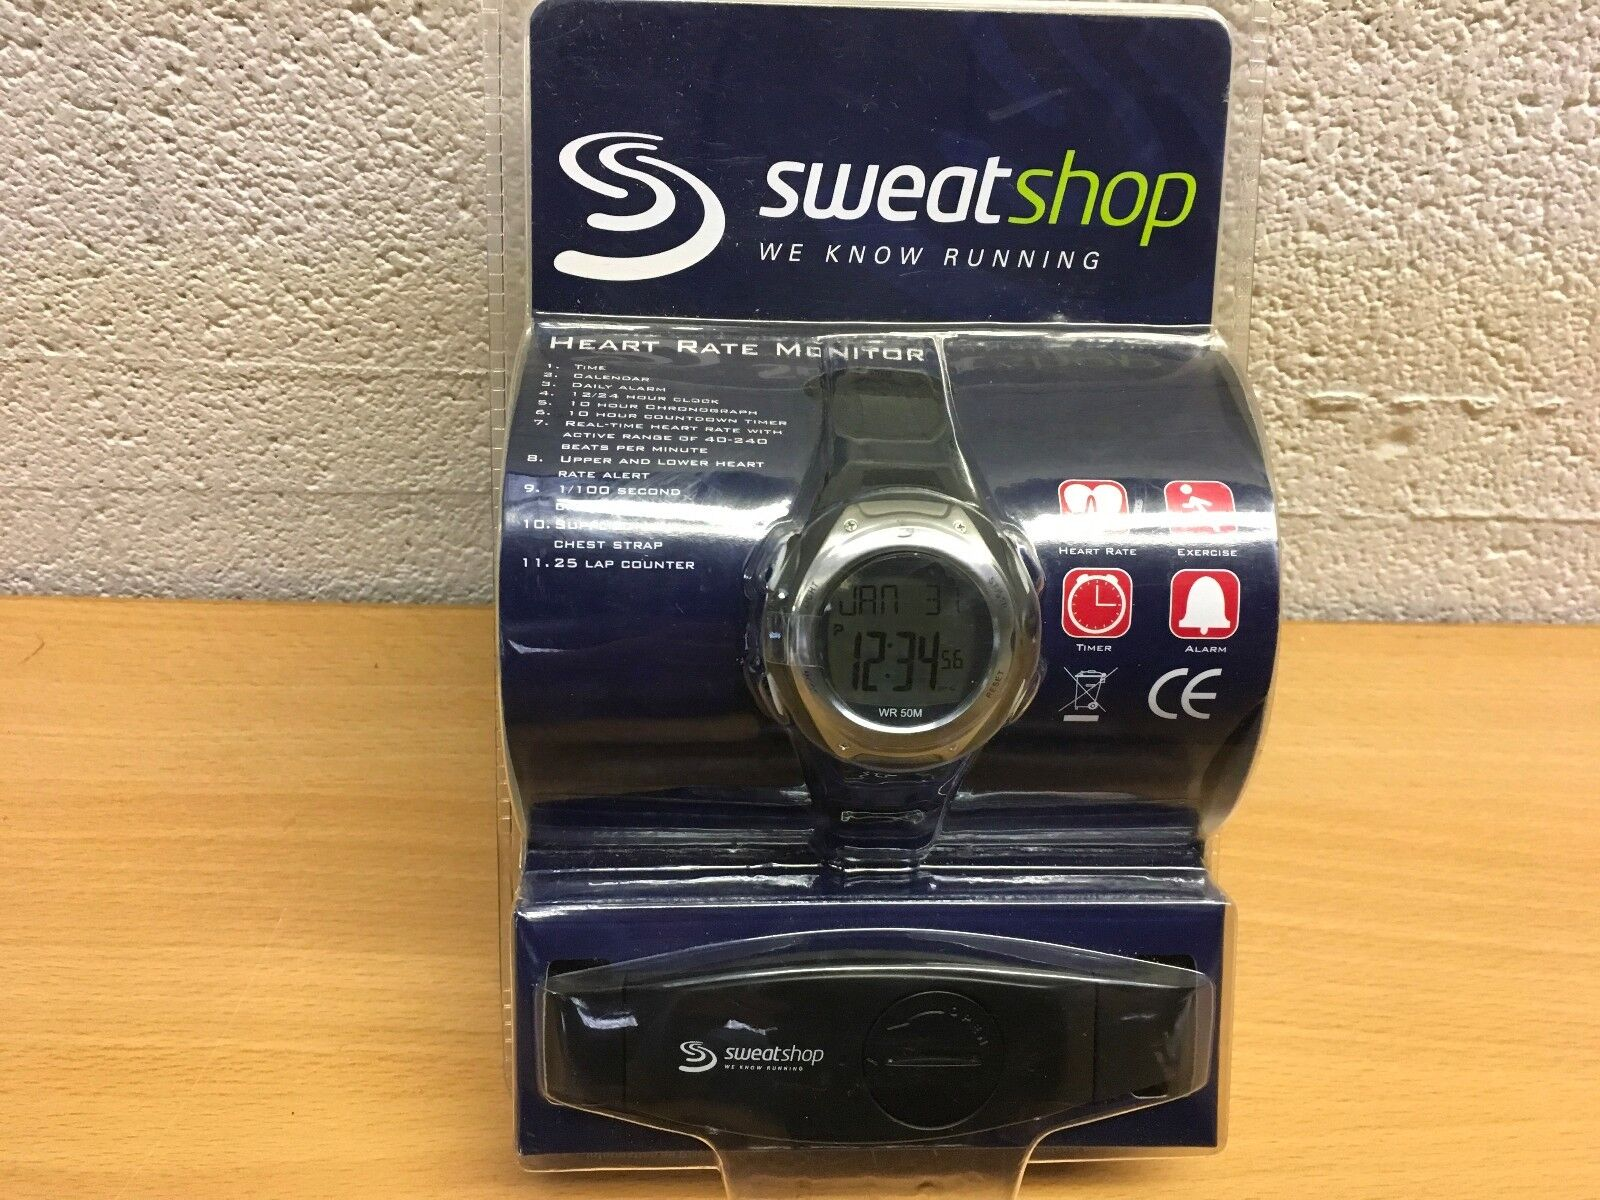 SWEATSHOP HEART RATE MONITOR WATCH RUNNING NEW